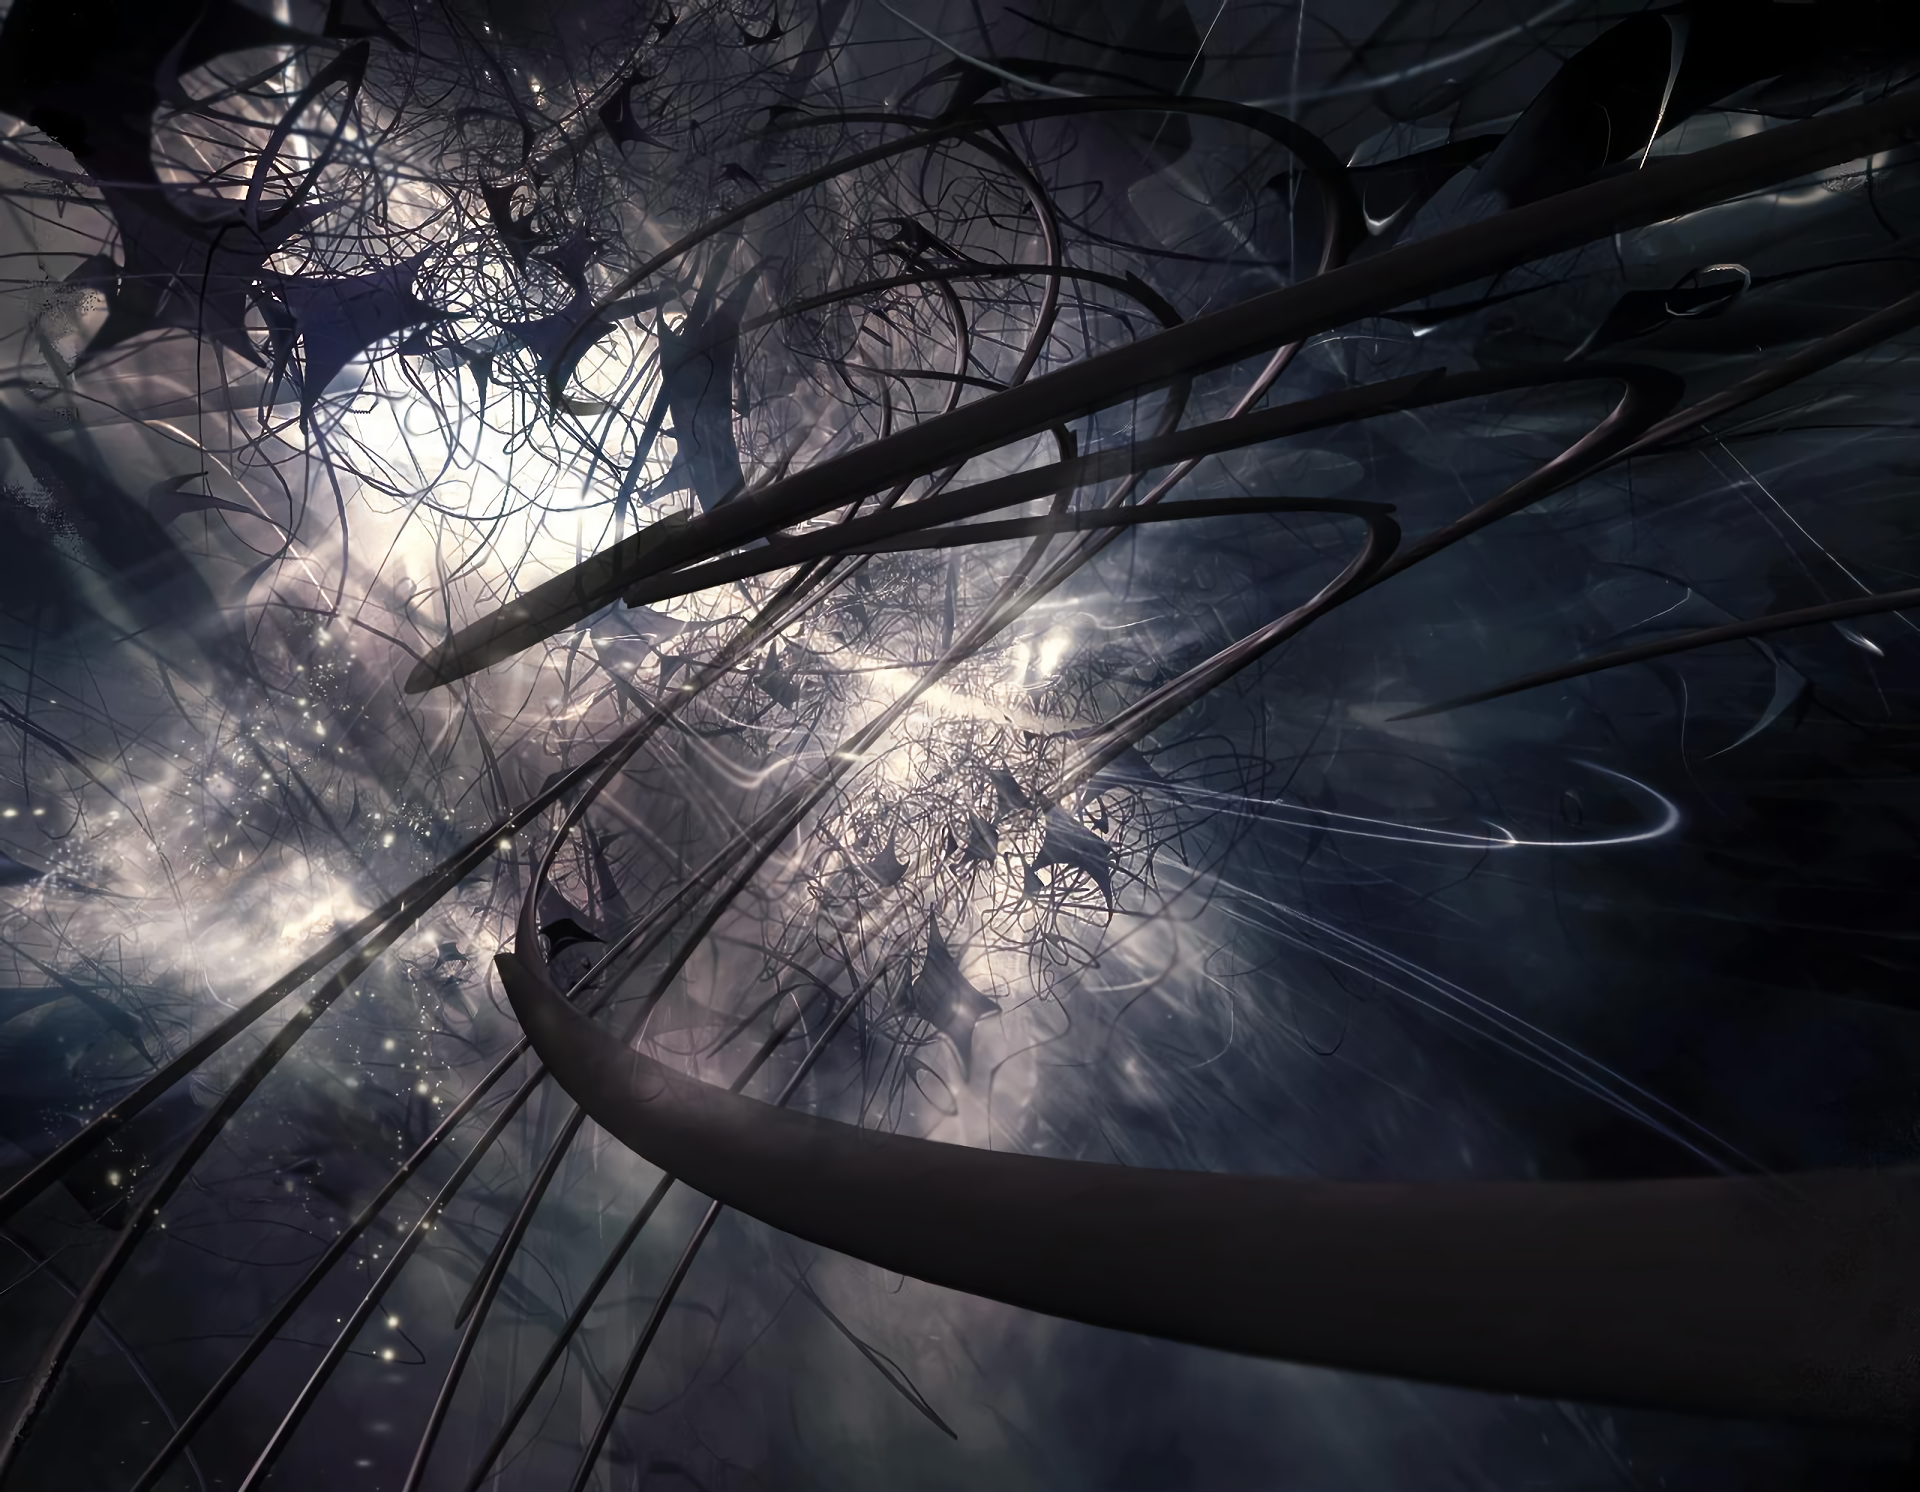 Abstract Dark Backgrounds - HD Wallpaper